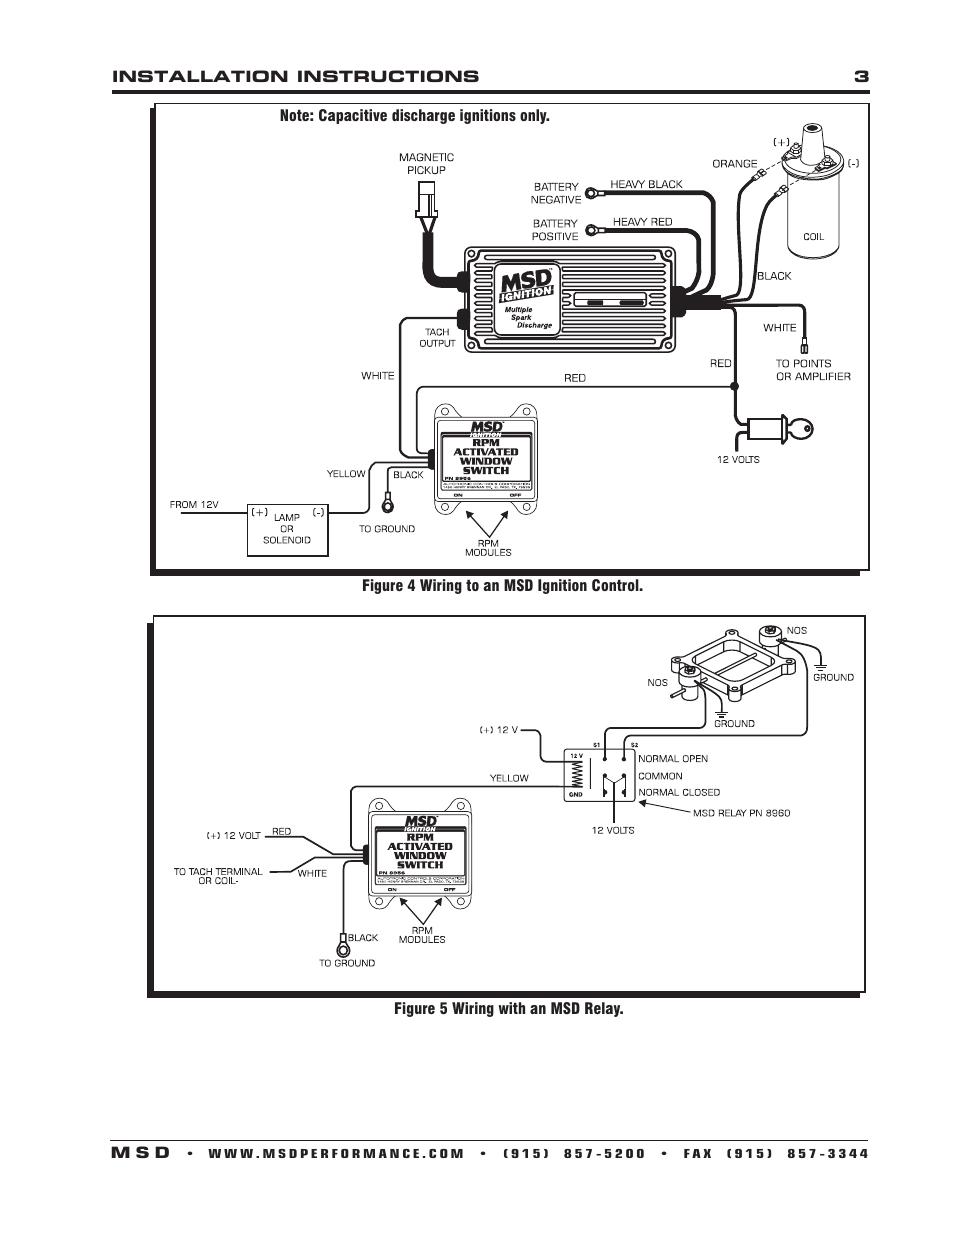 msd rpm switch wiring diagram 642 msd rpm switch wiring diagram fuse  wiring and manual library  642 msd rpm switch wiring diagram